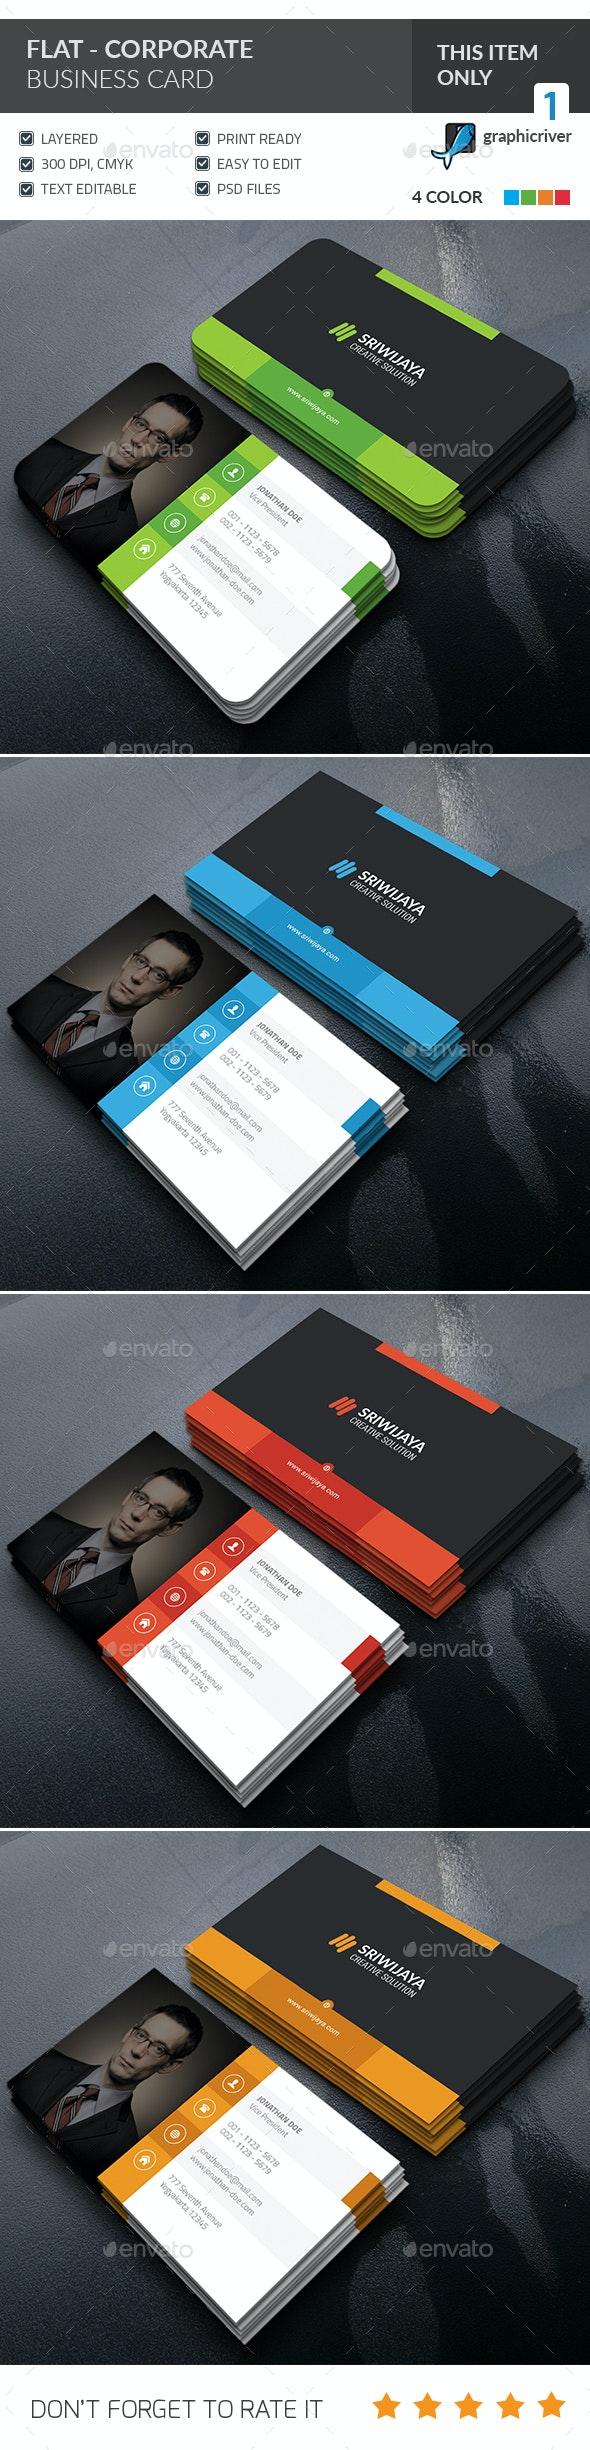 Flat Corporate Business Card  - Corporate Business Cards